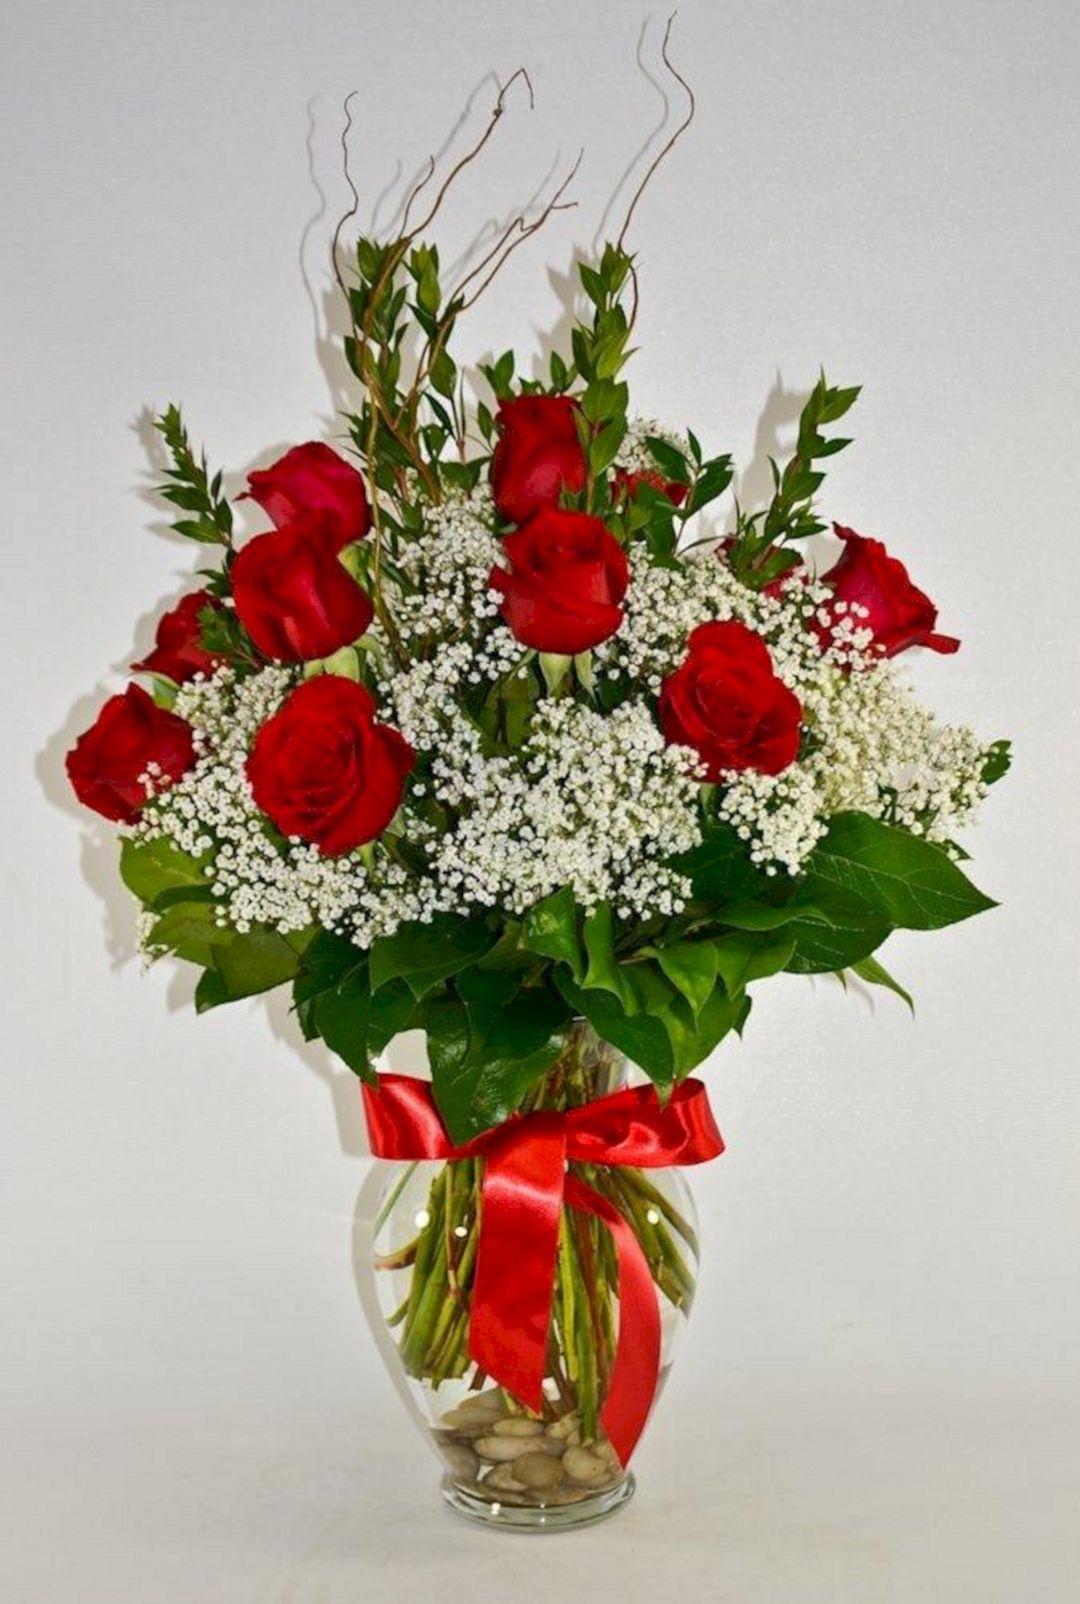 24 beautiful flowers arrangements ideas for valentine day diy outstanding 24 beautiful flowers arrangements ideas for valentine day https24spaces izmirmasajfo